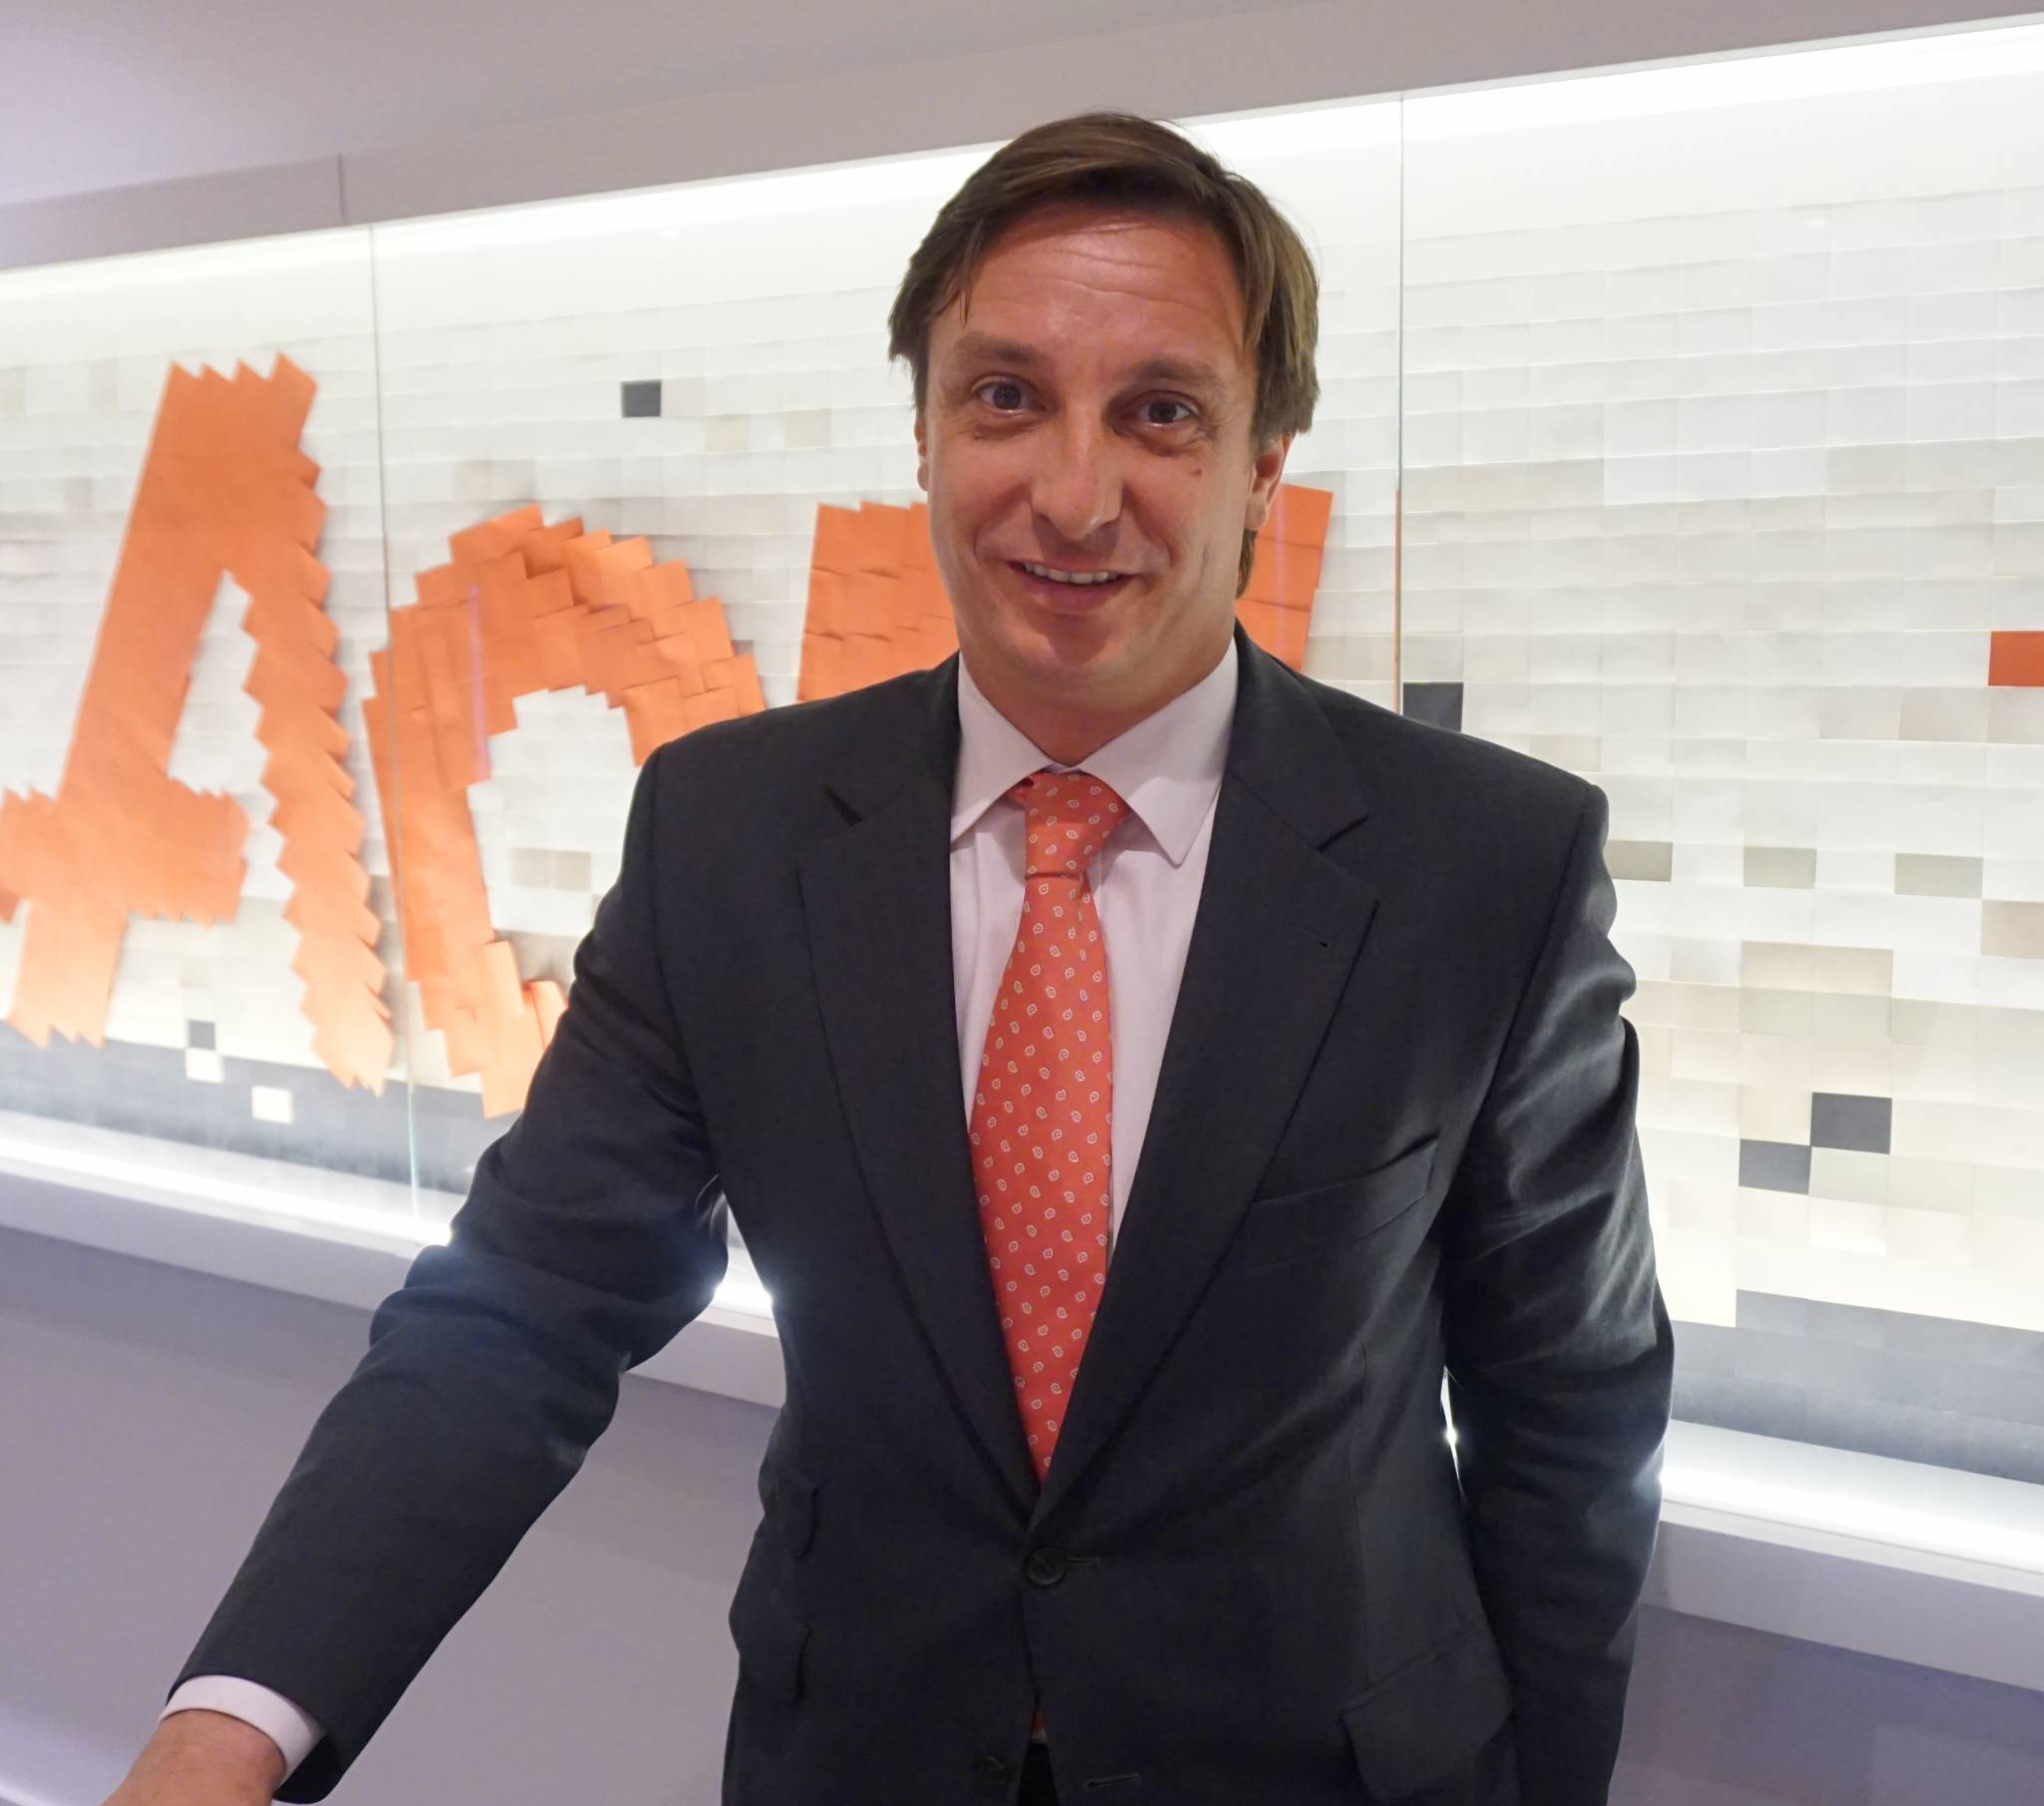 Pablo Montoliú, CIO de AON